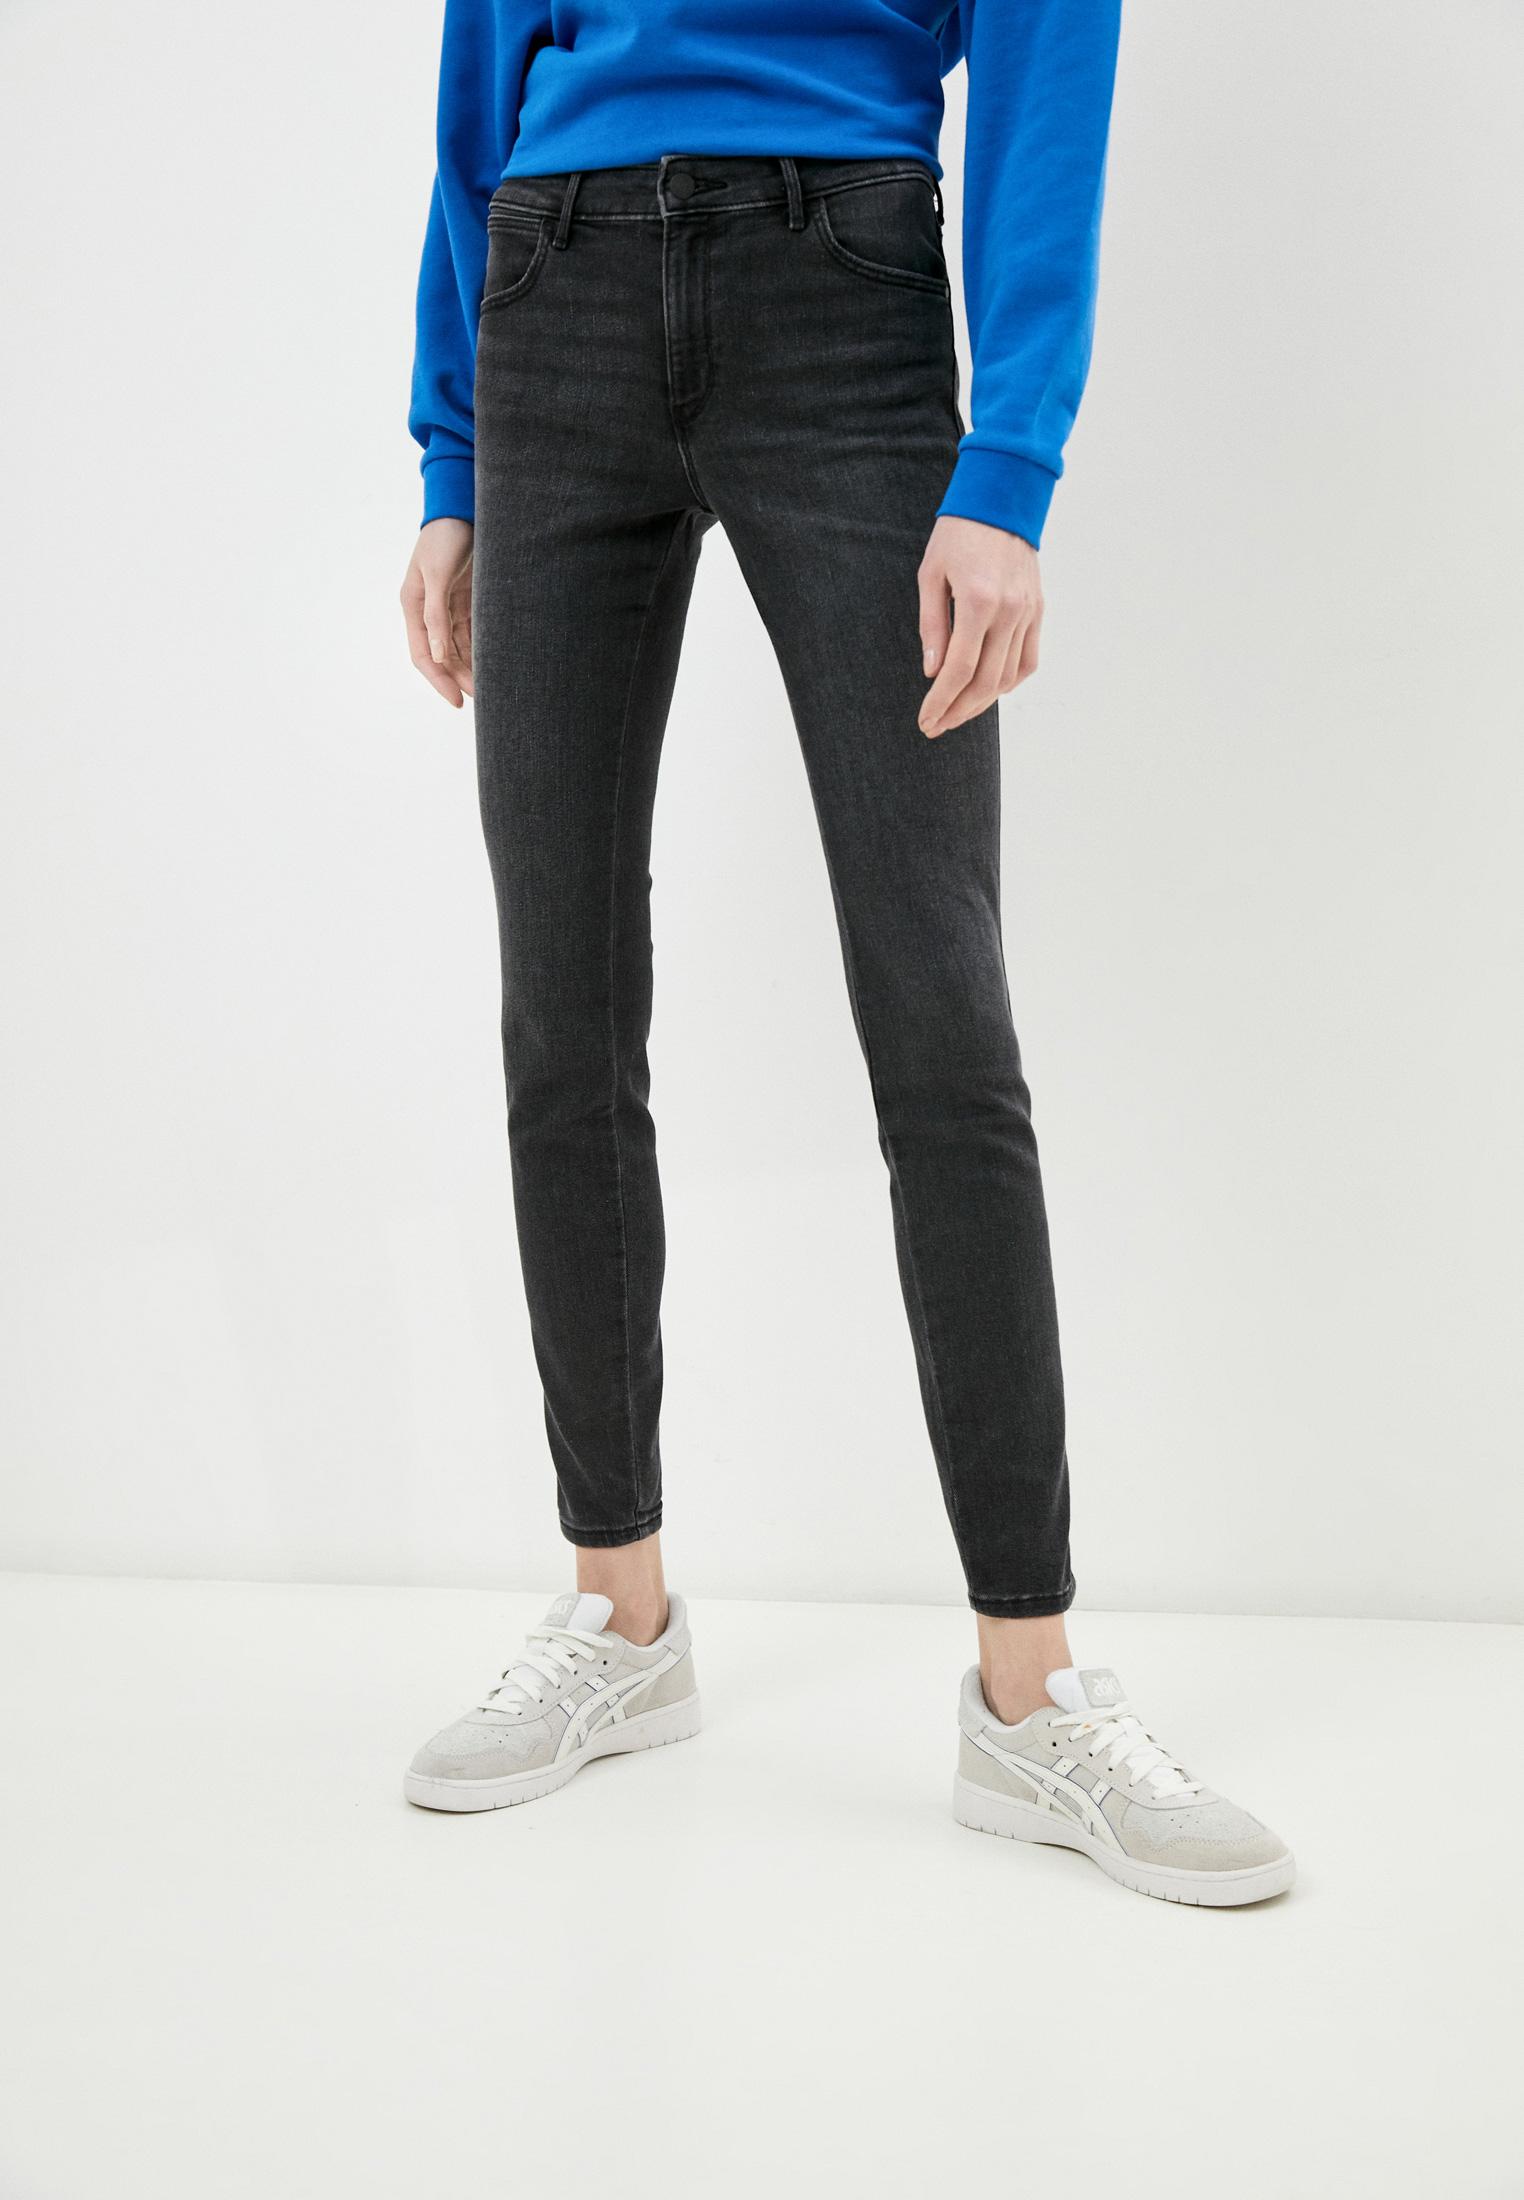 Зауженные джинсы Wrangler (Вранглер) Джинсы Wrangler